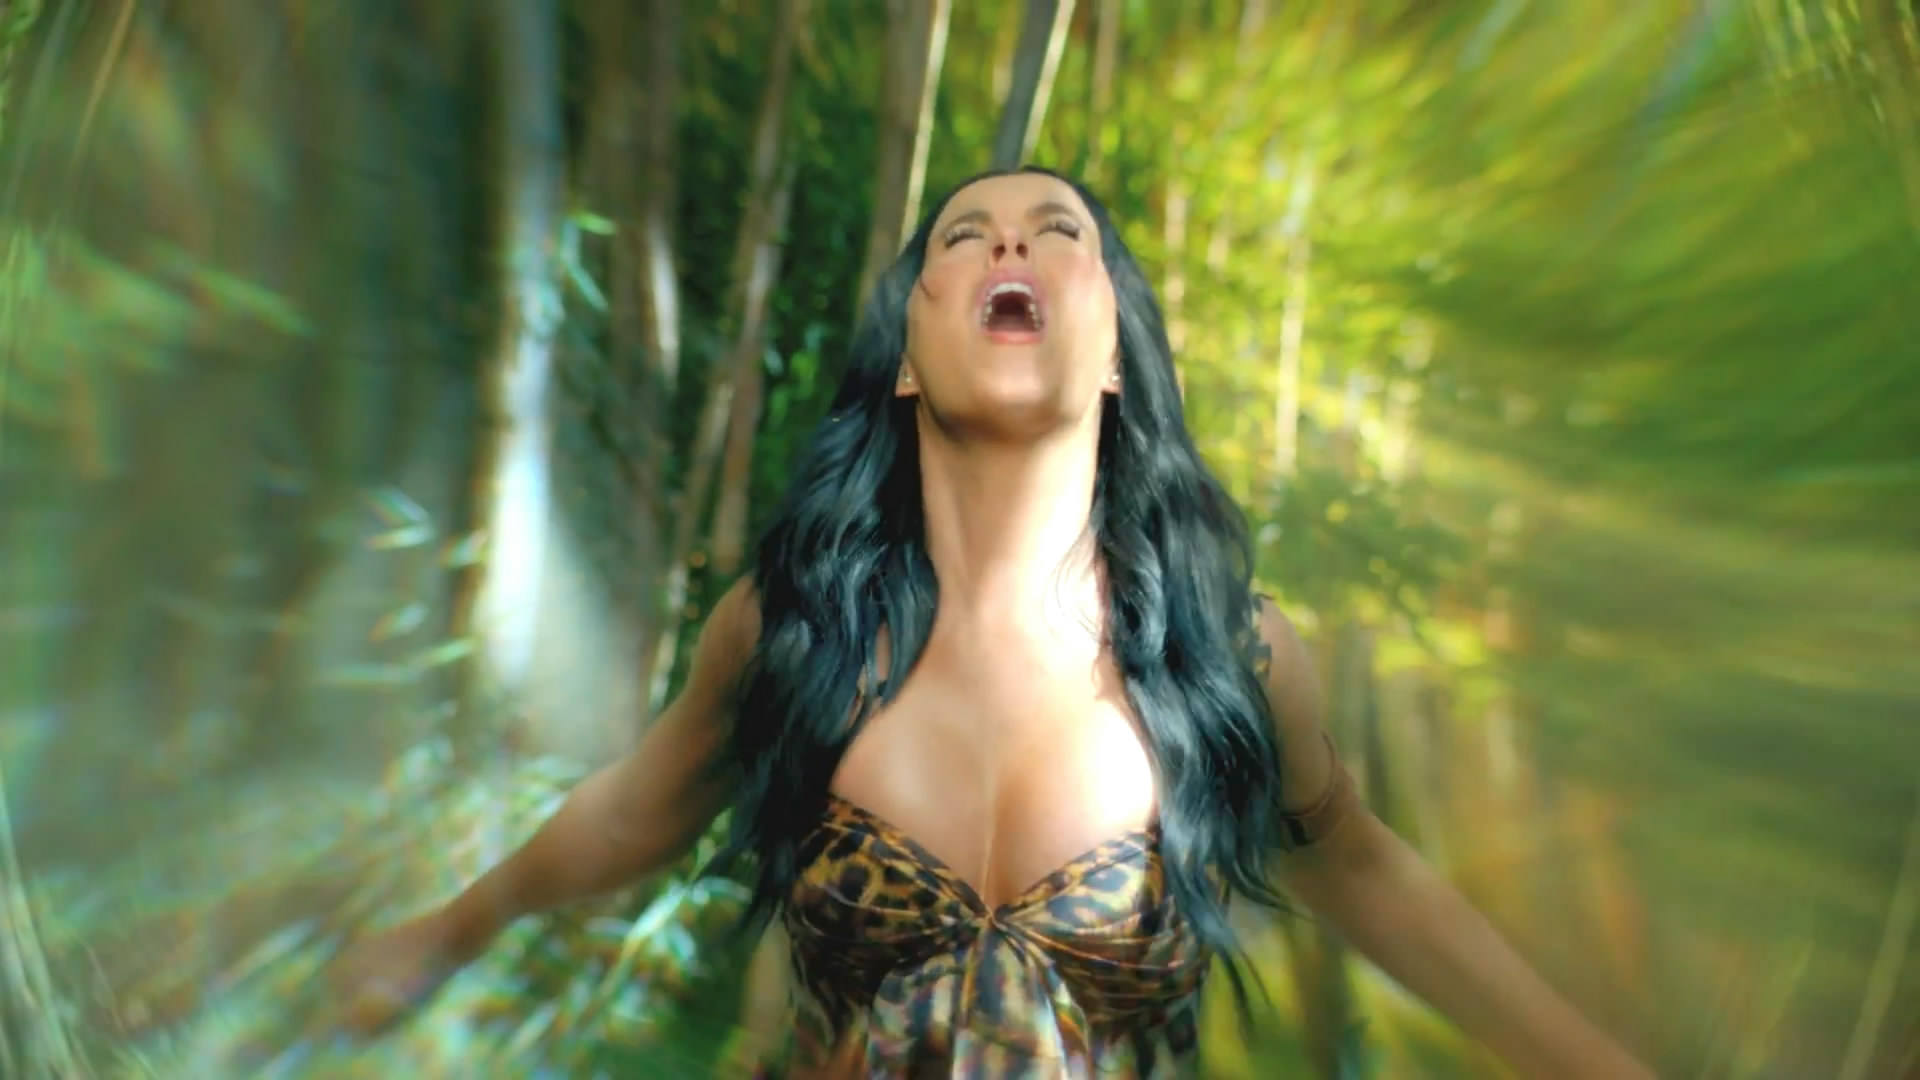 Ariana grande porn music video Part 4 9